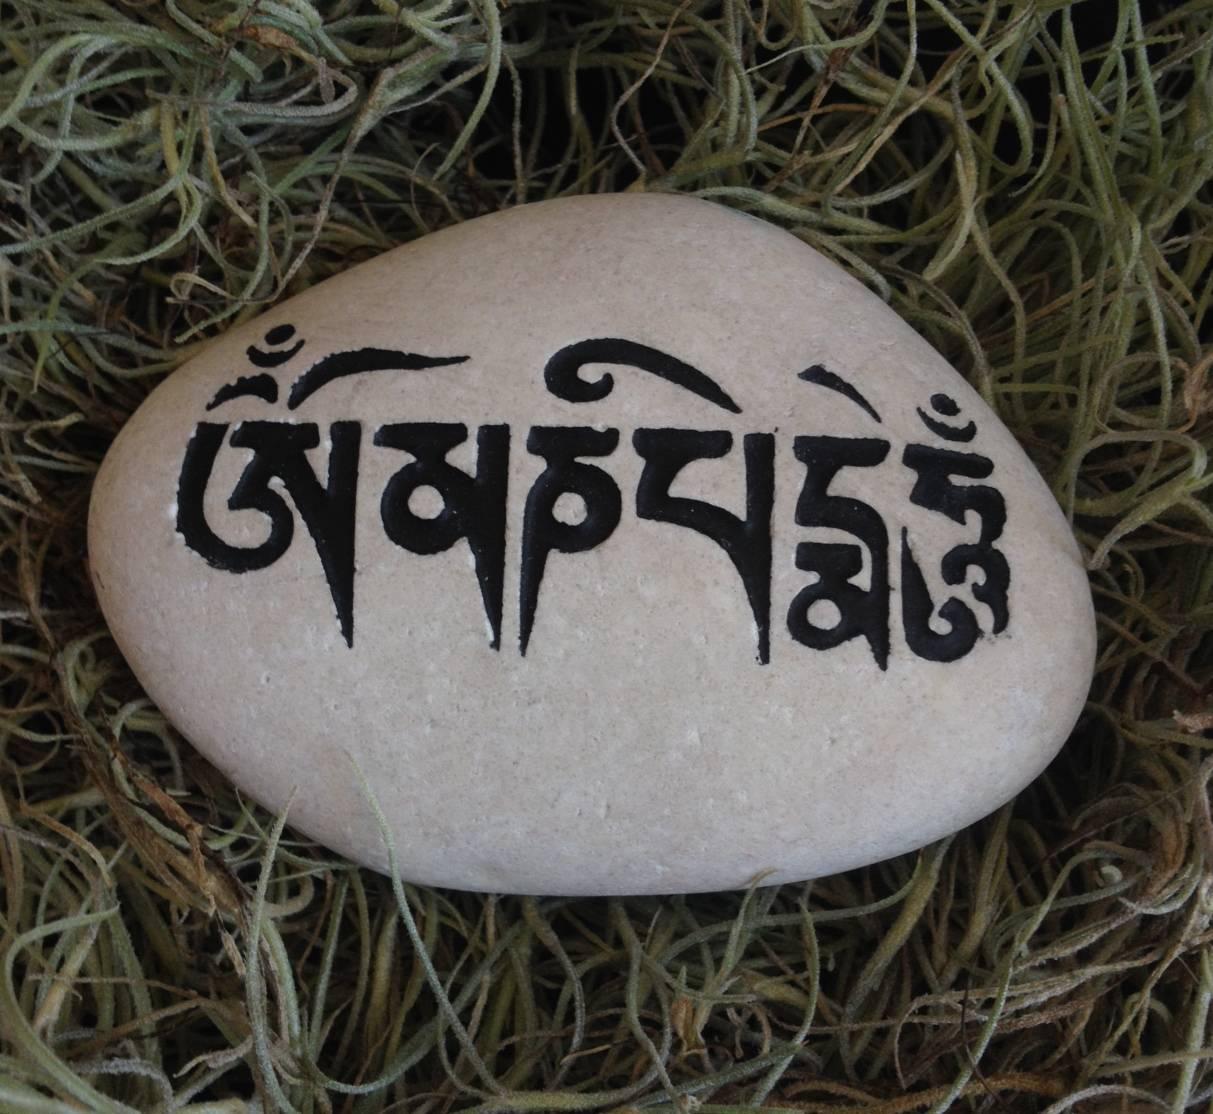 Om Mani Padme Hum Engraved Rock - Mantra of Compassion